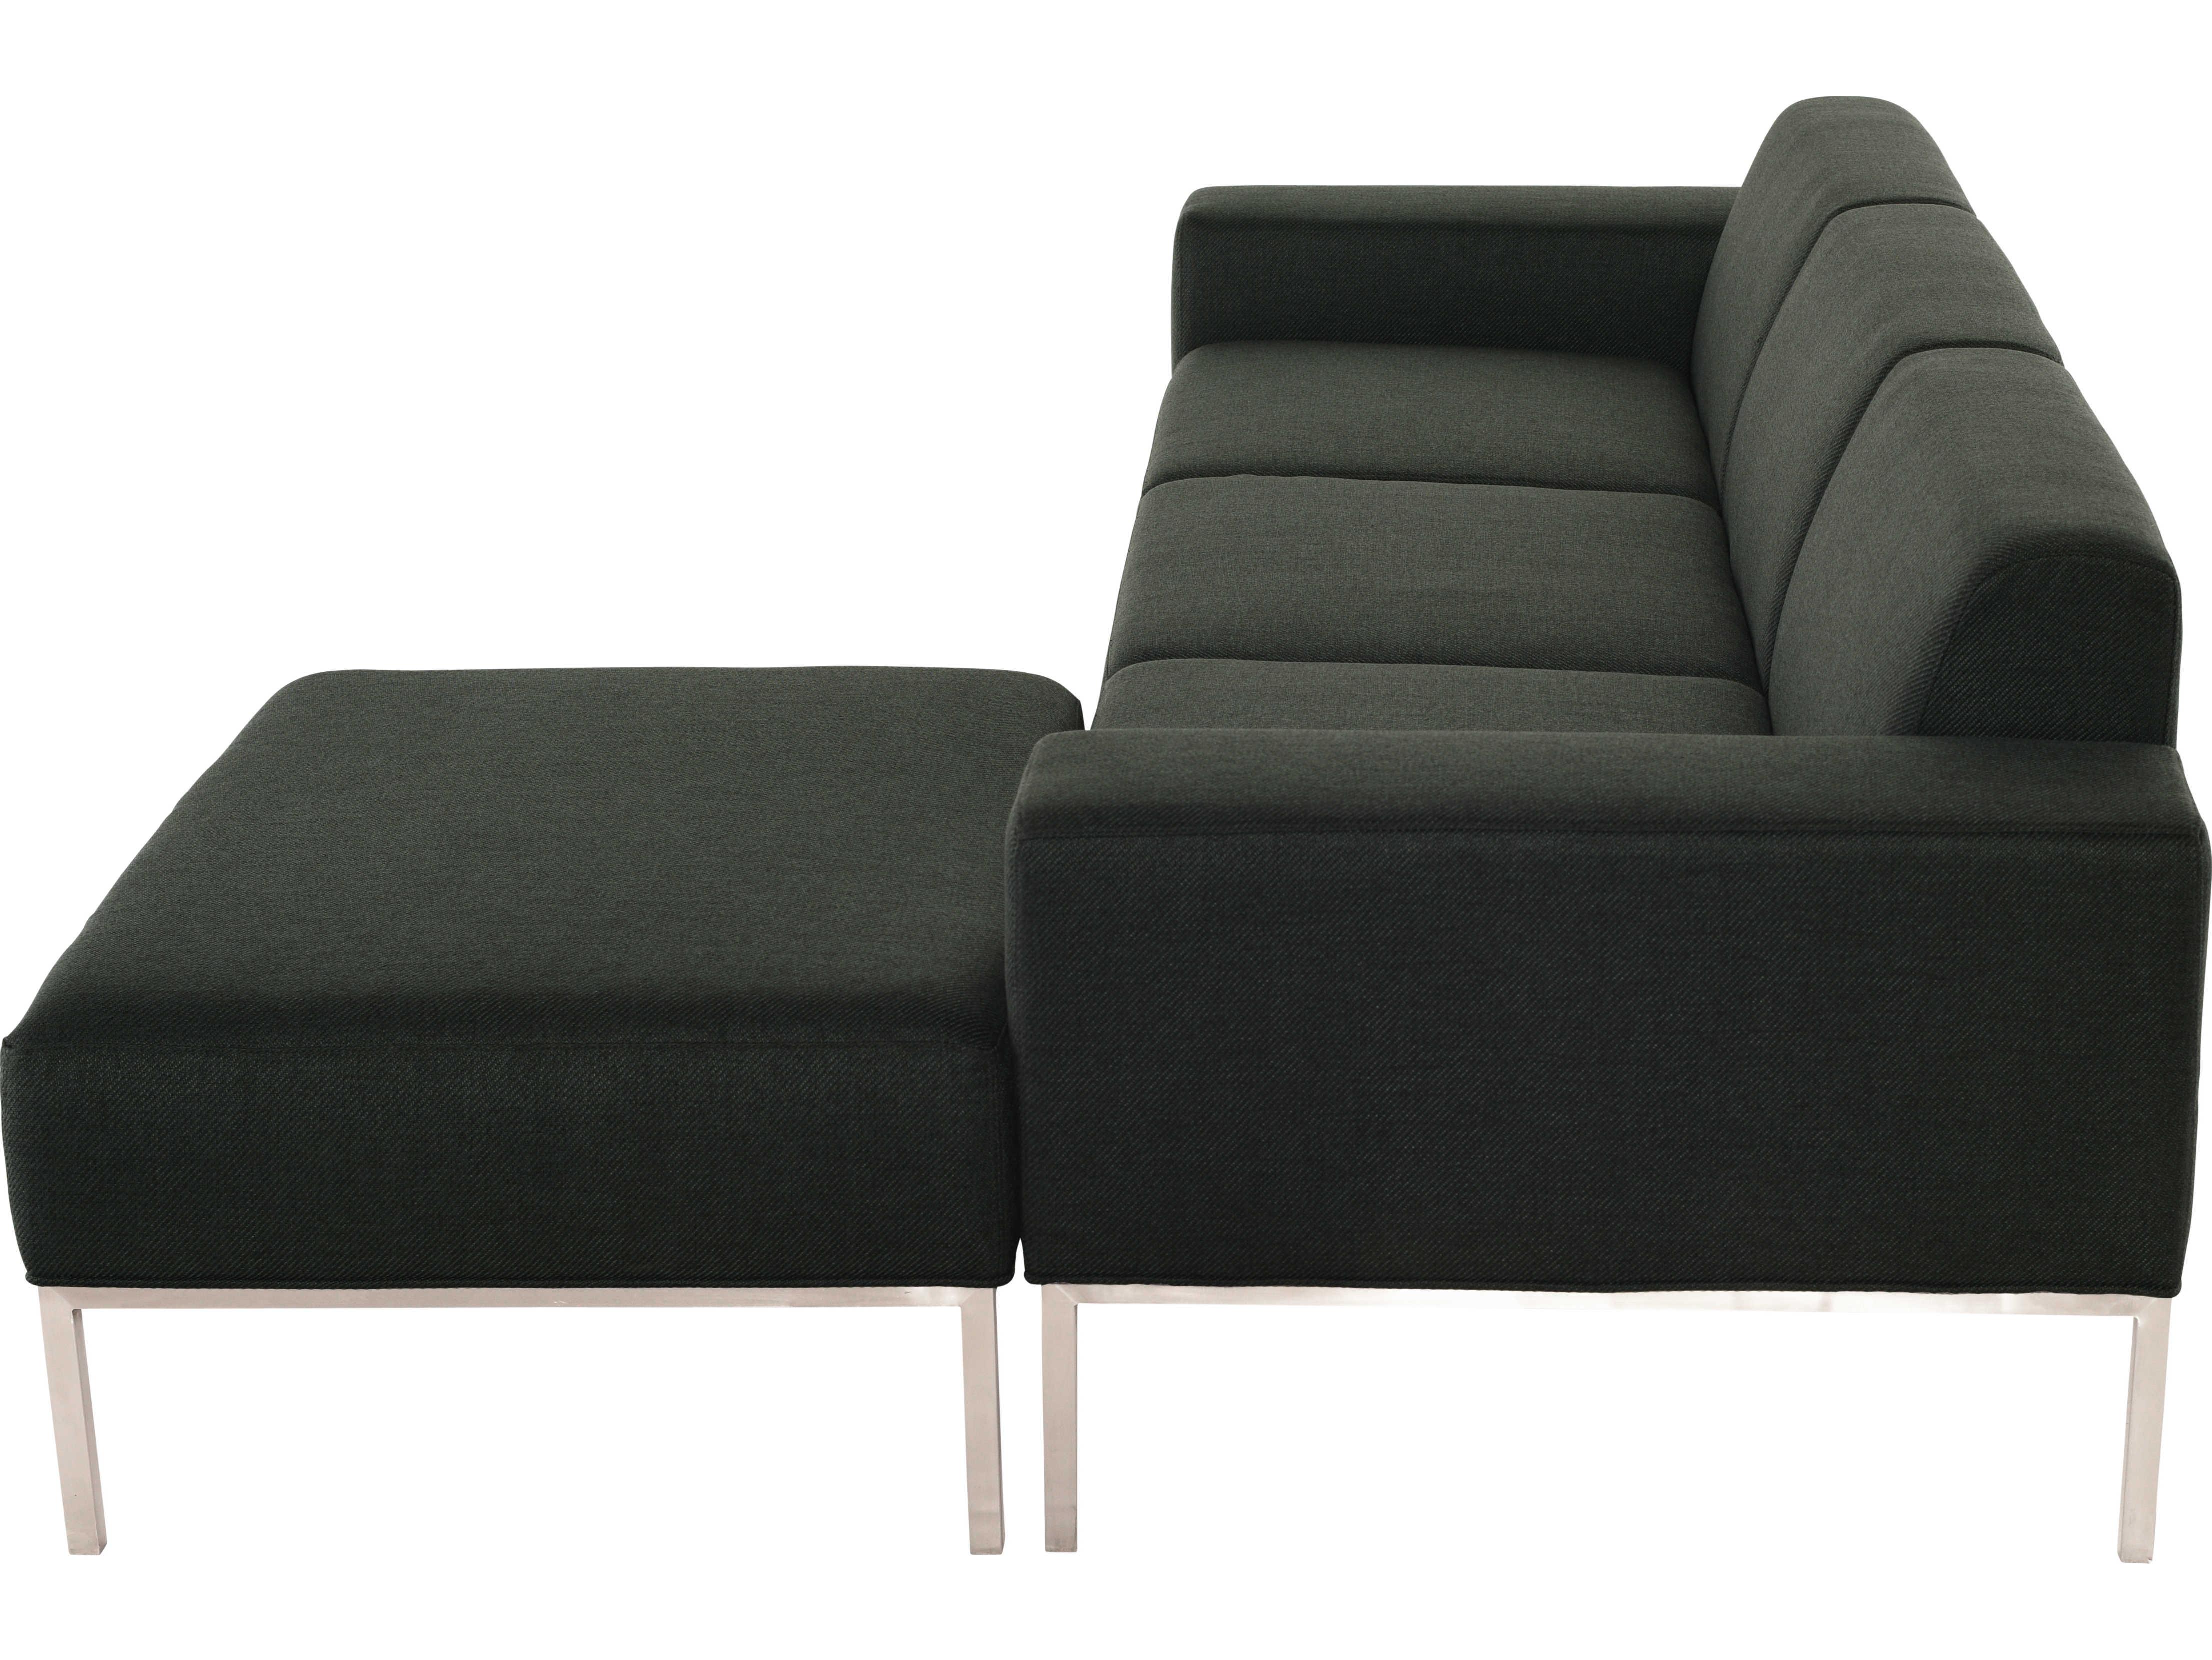 Phenomenal Nuevo Living Bryce Sofa Lamtechconsult Wood Chair Design Ideas Lamtechconsultcom